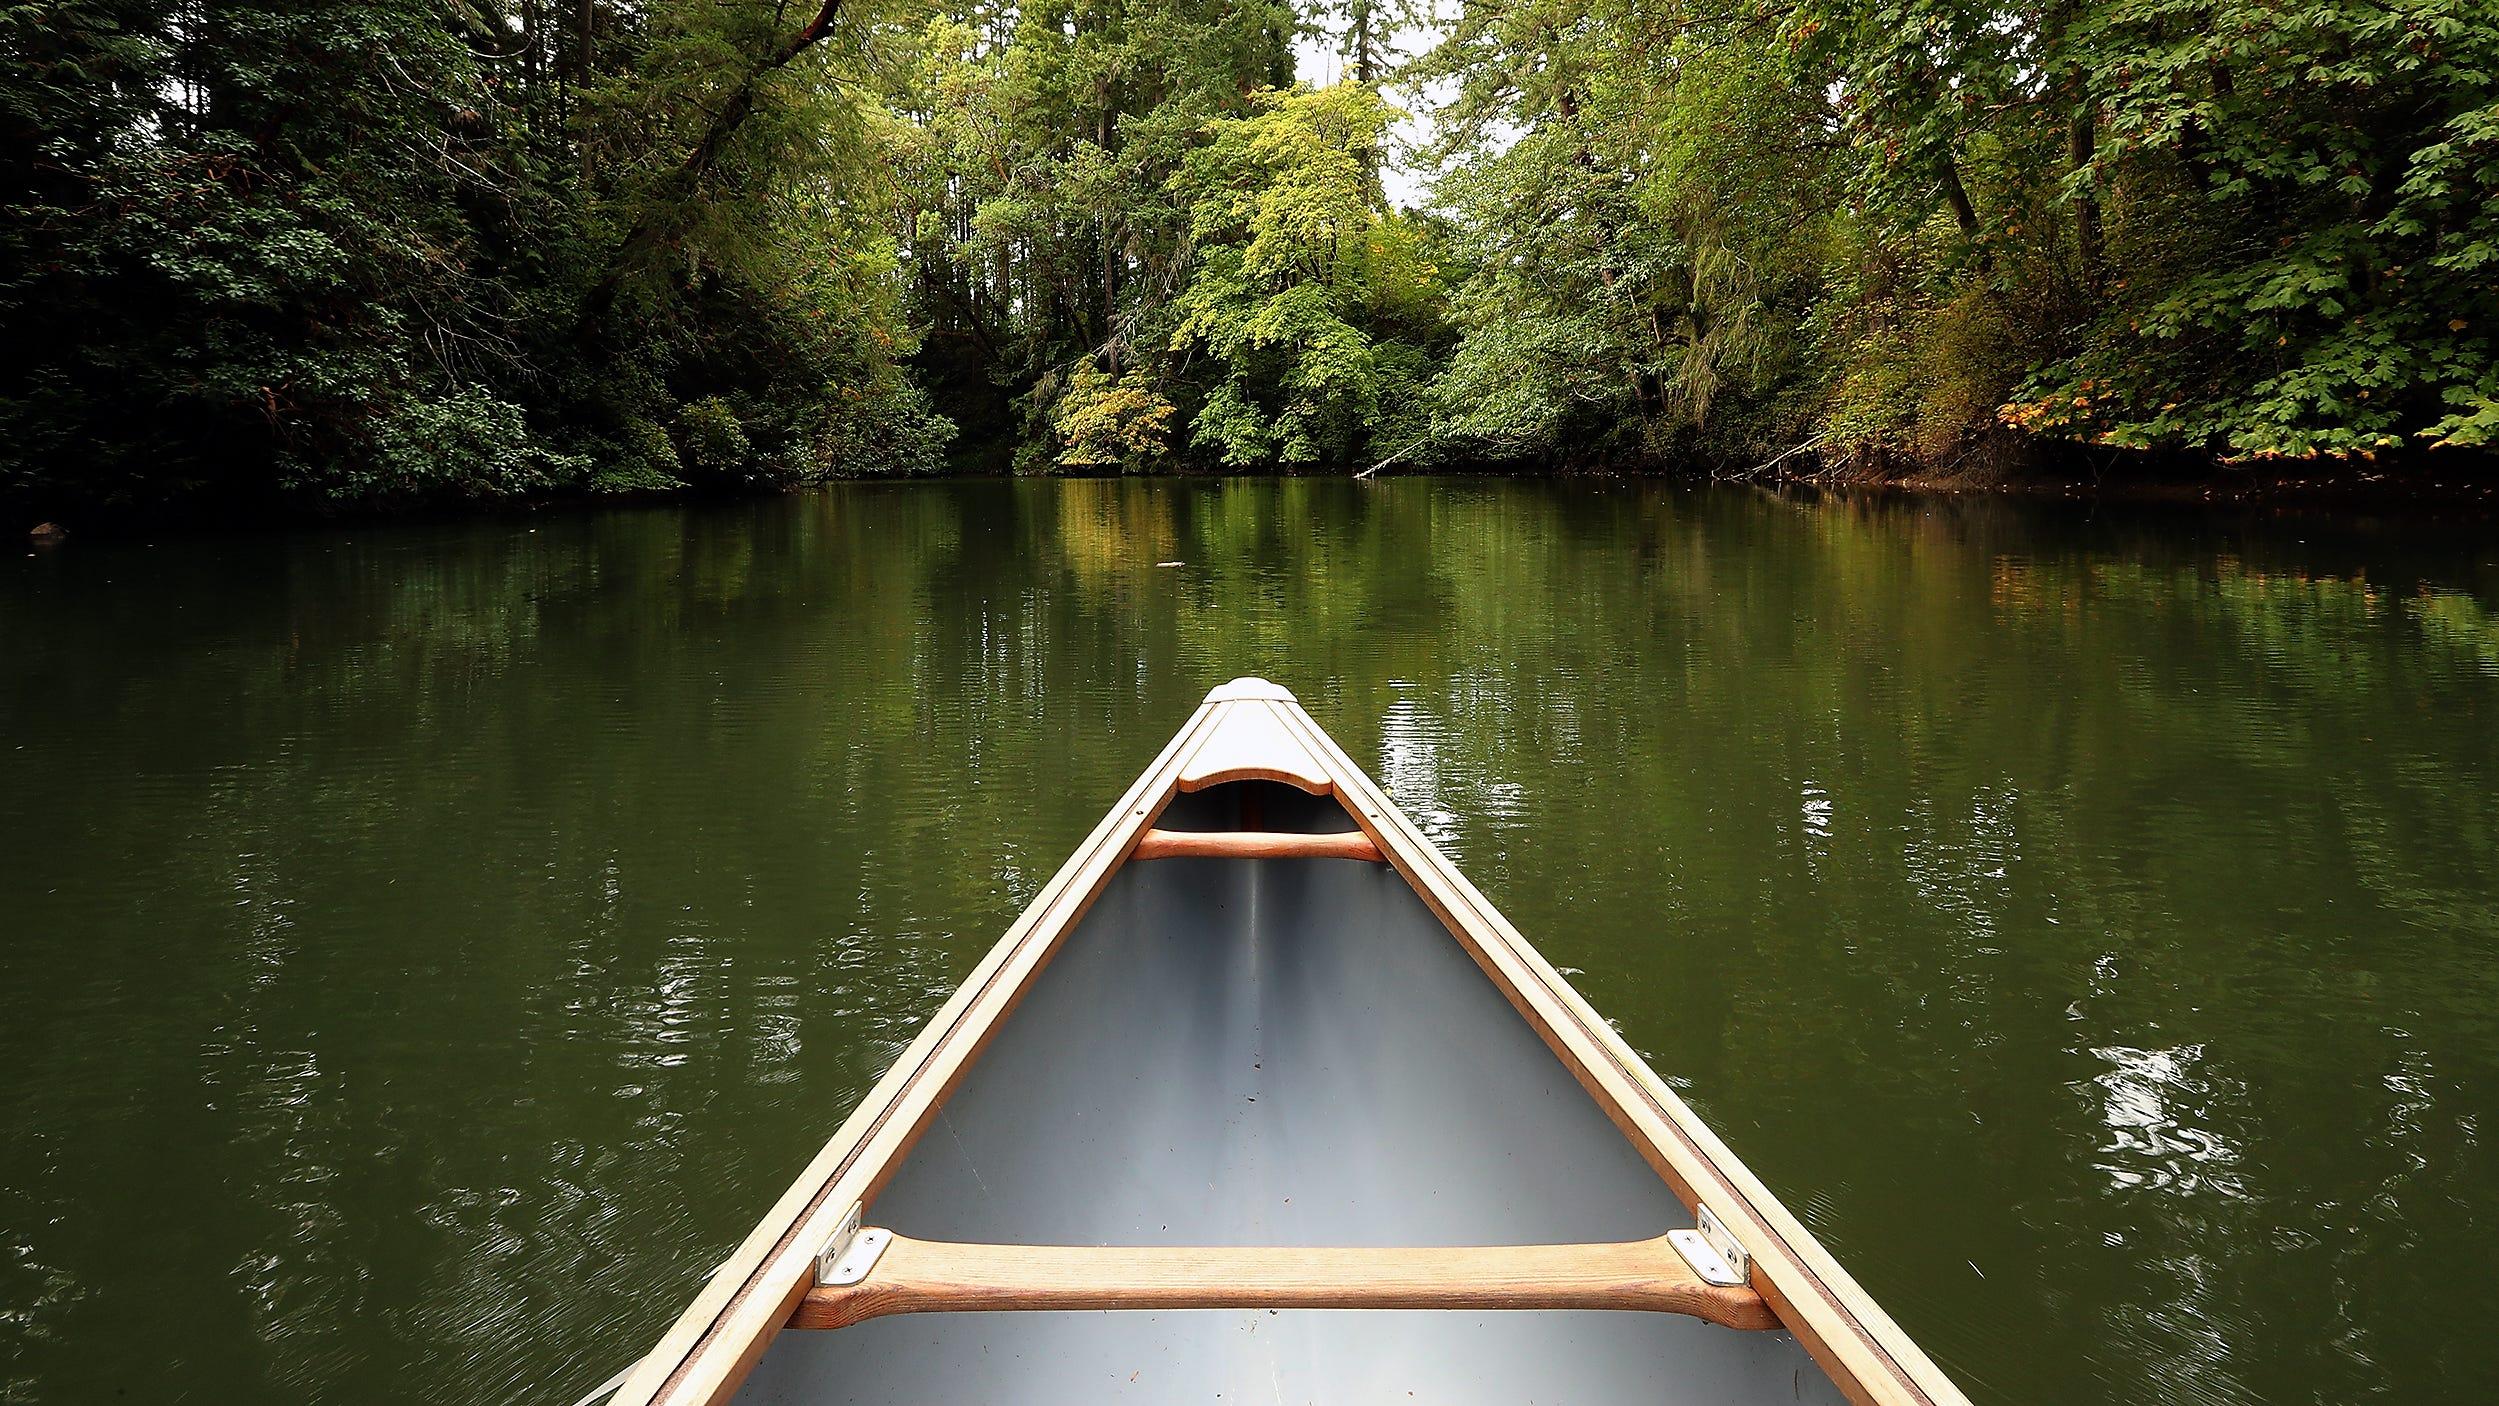 Bainbridge Island Land Trust acquiring waterfront property to open as nature preserve